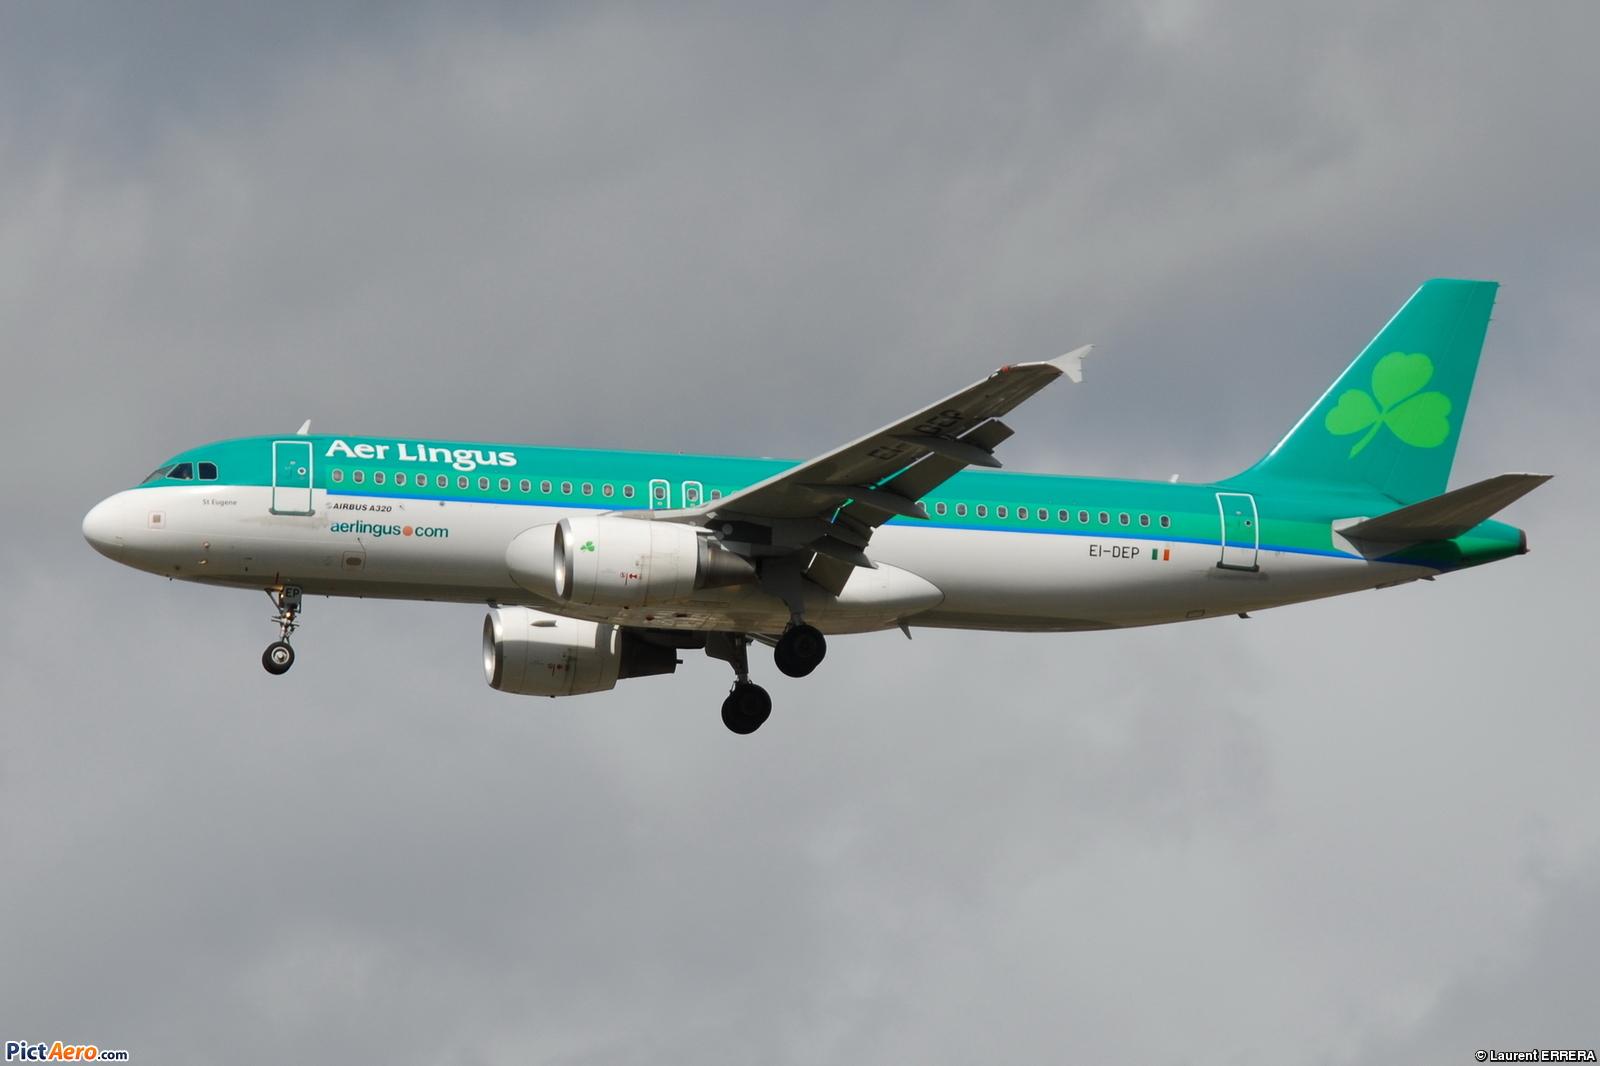 File:Airbus A320-200 Aer Lingus (EIN) EI-DEP - MSN